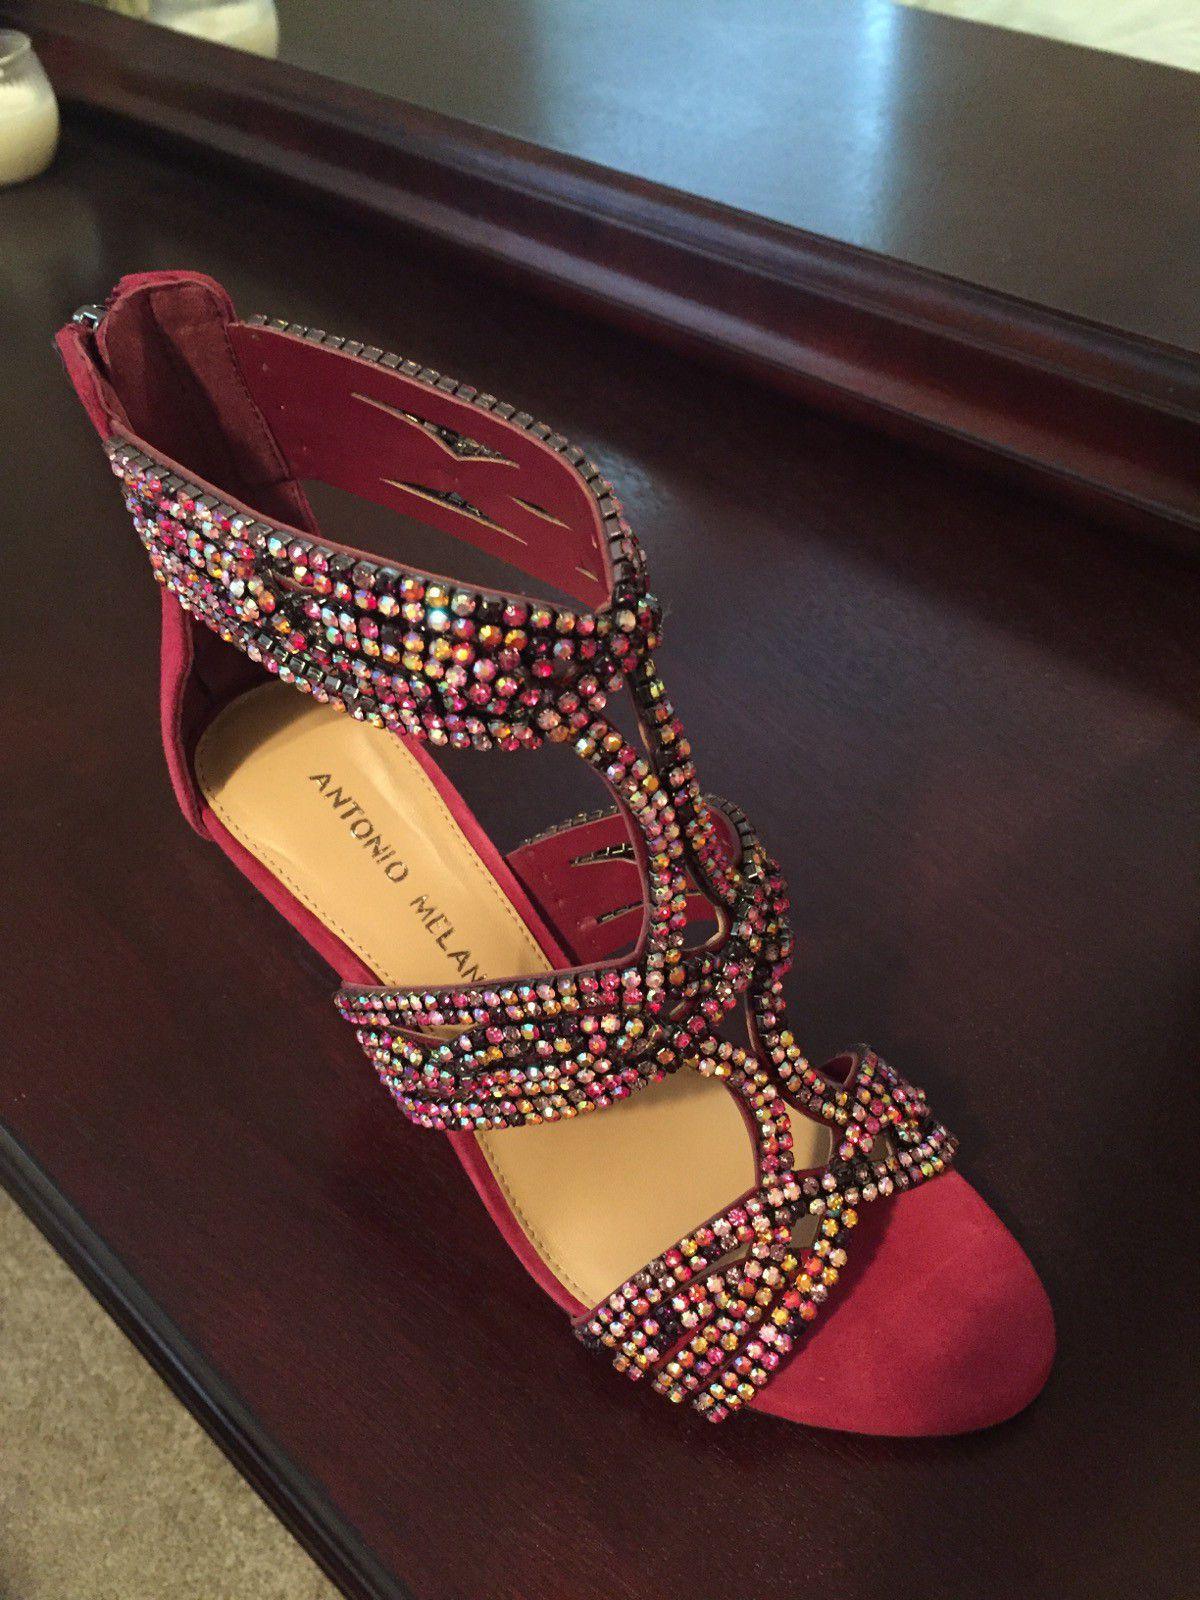 Size 6.5 Mulberry Antonio Melani Vero Cuoio Heeled Sandals.